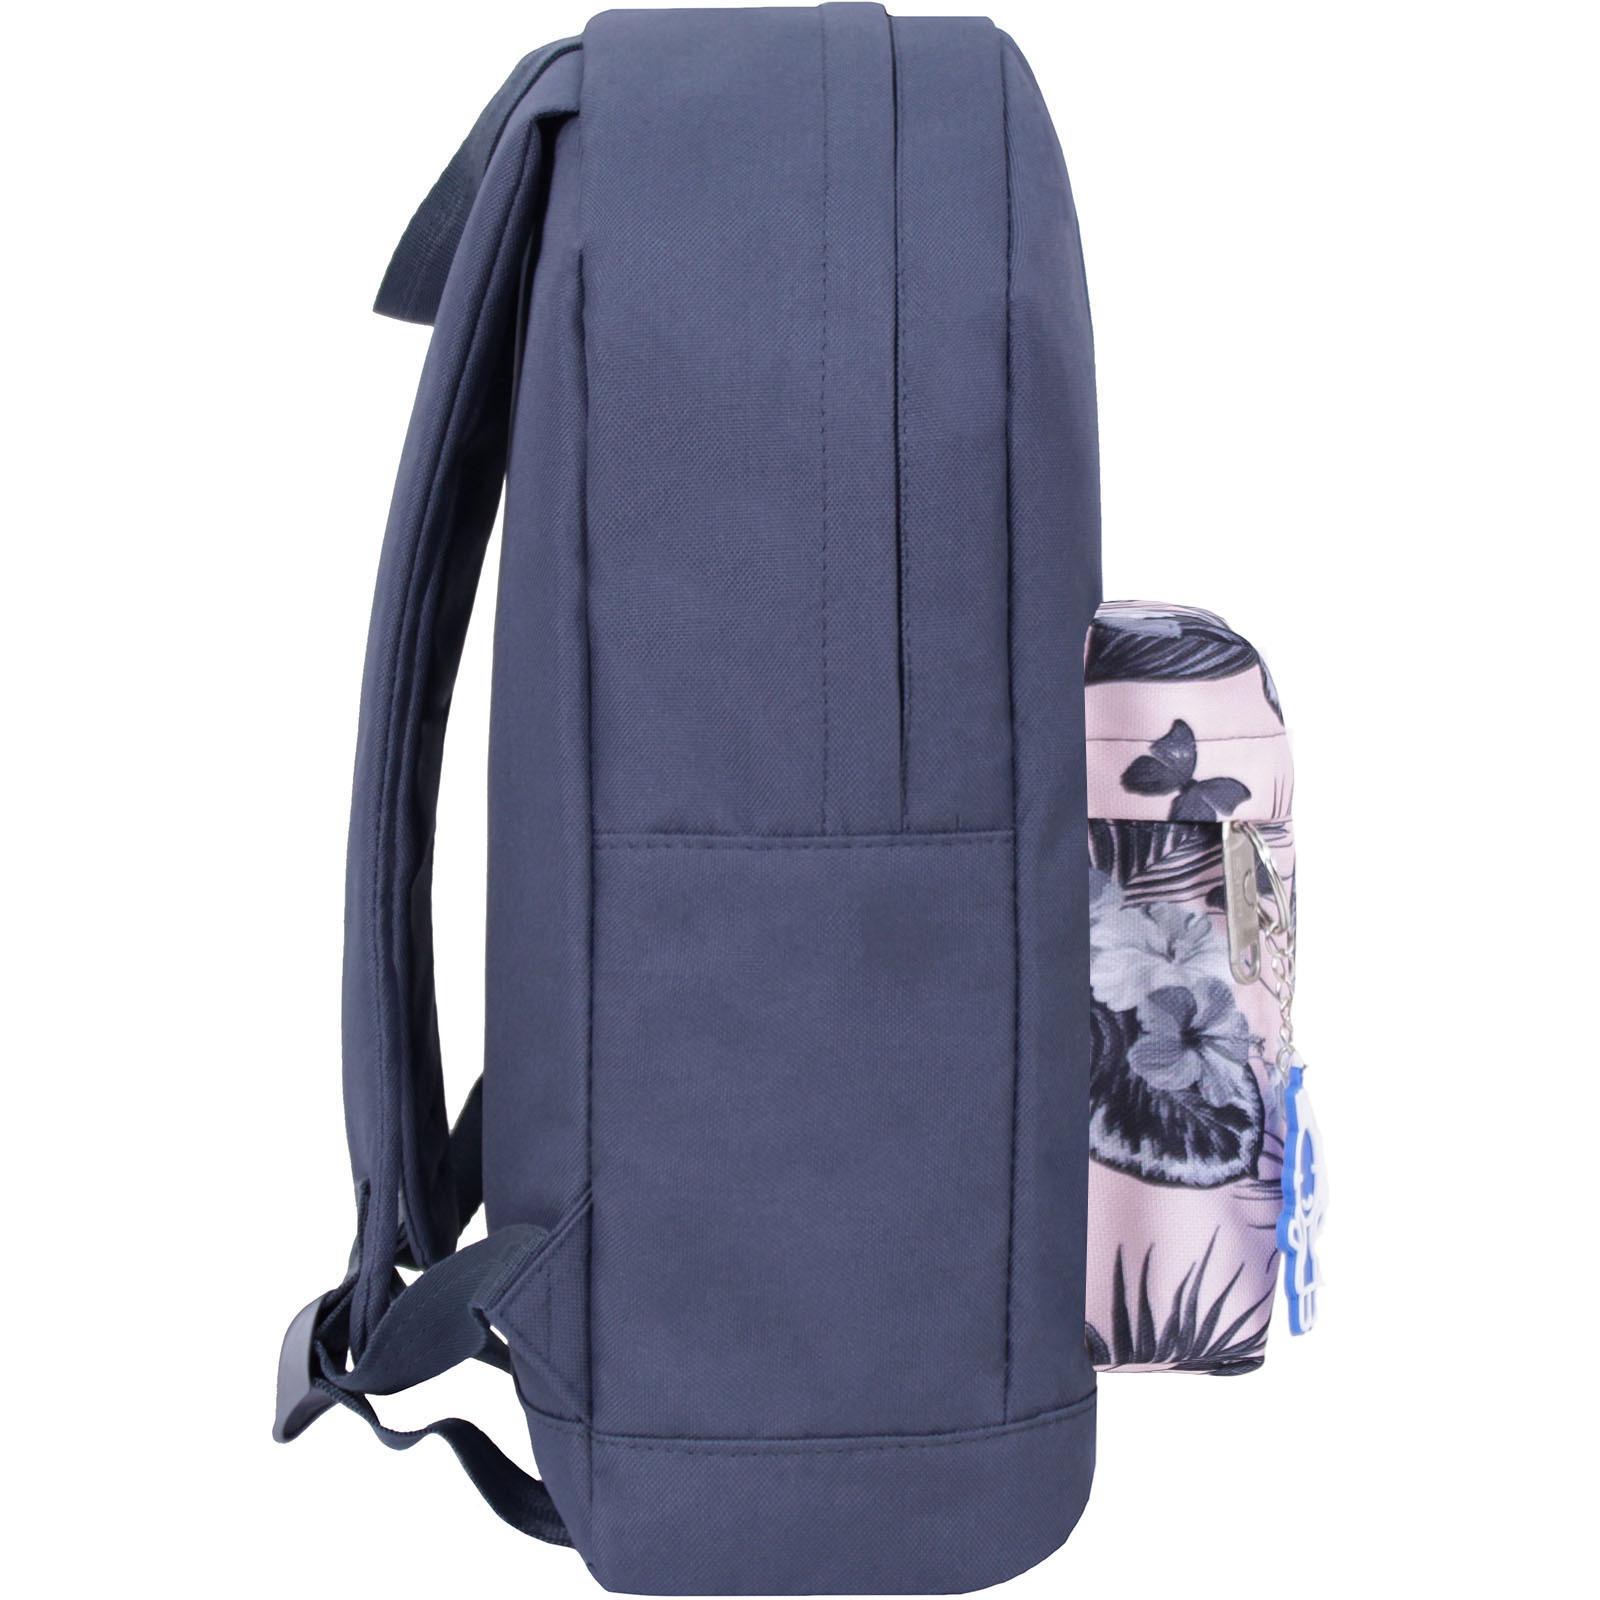 Рюкзак Bagland Молодежный W/R 17 л. серый 458 (00533662) фото 2